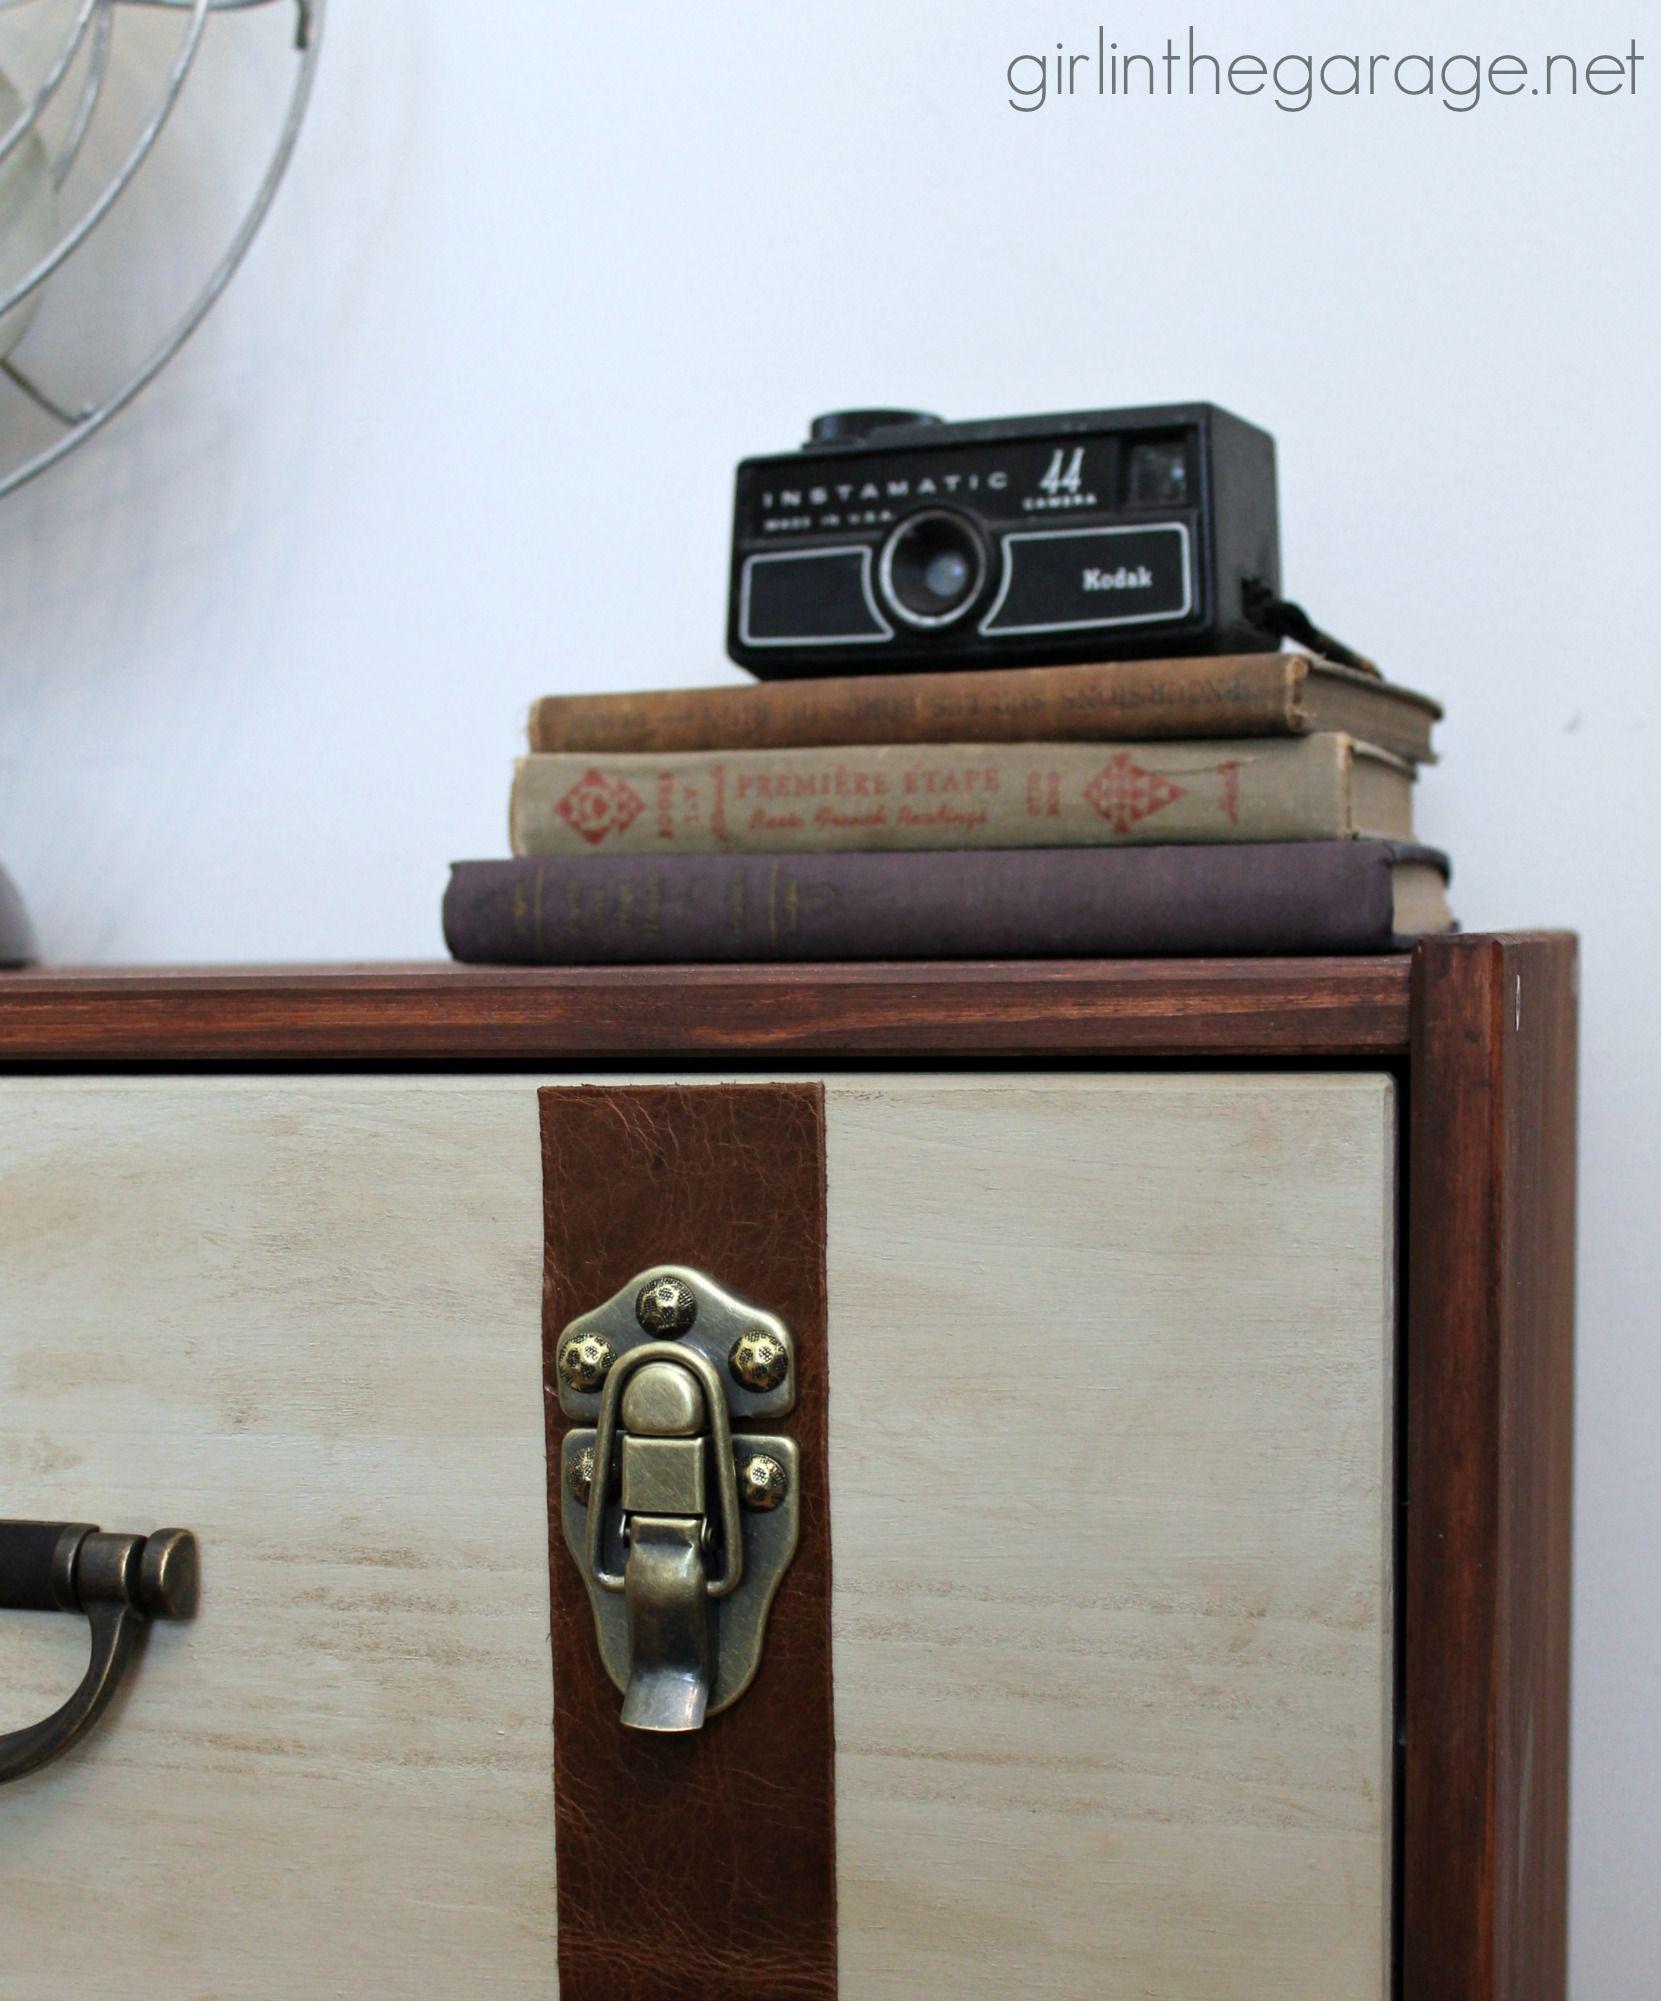 Ikea Tuning suitcase dresser ikea rast hack suitcase dresser and drawers